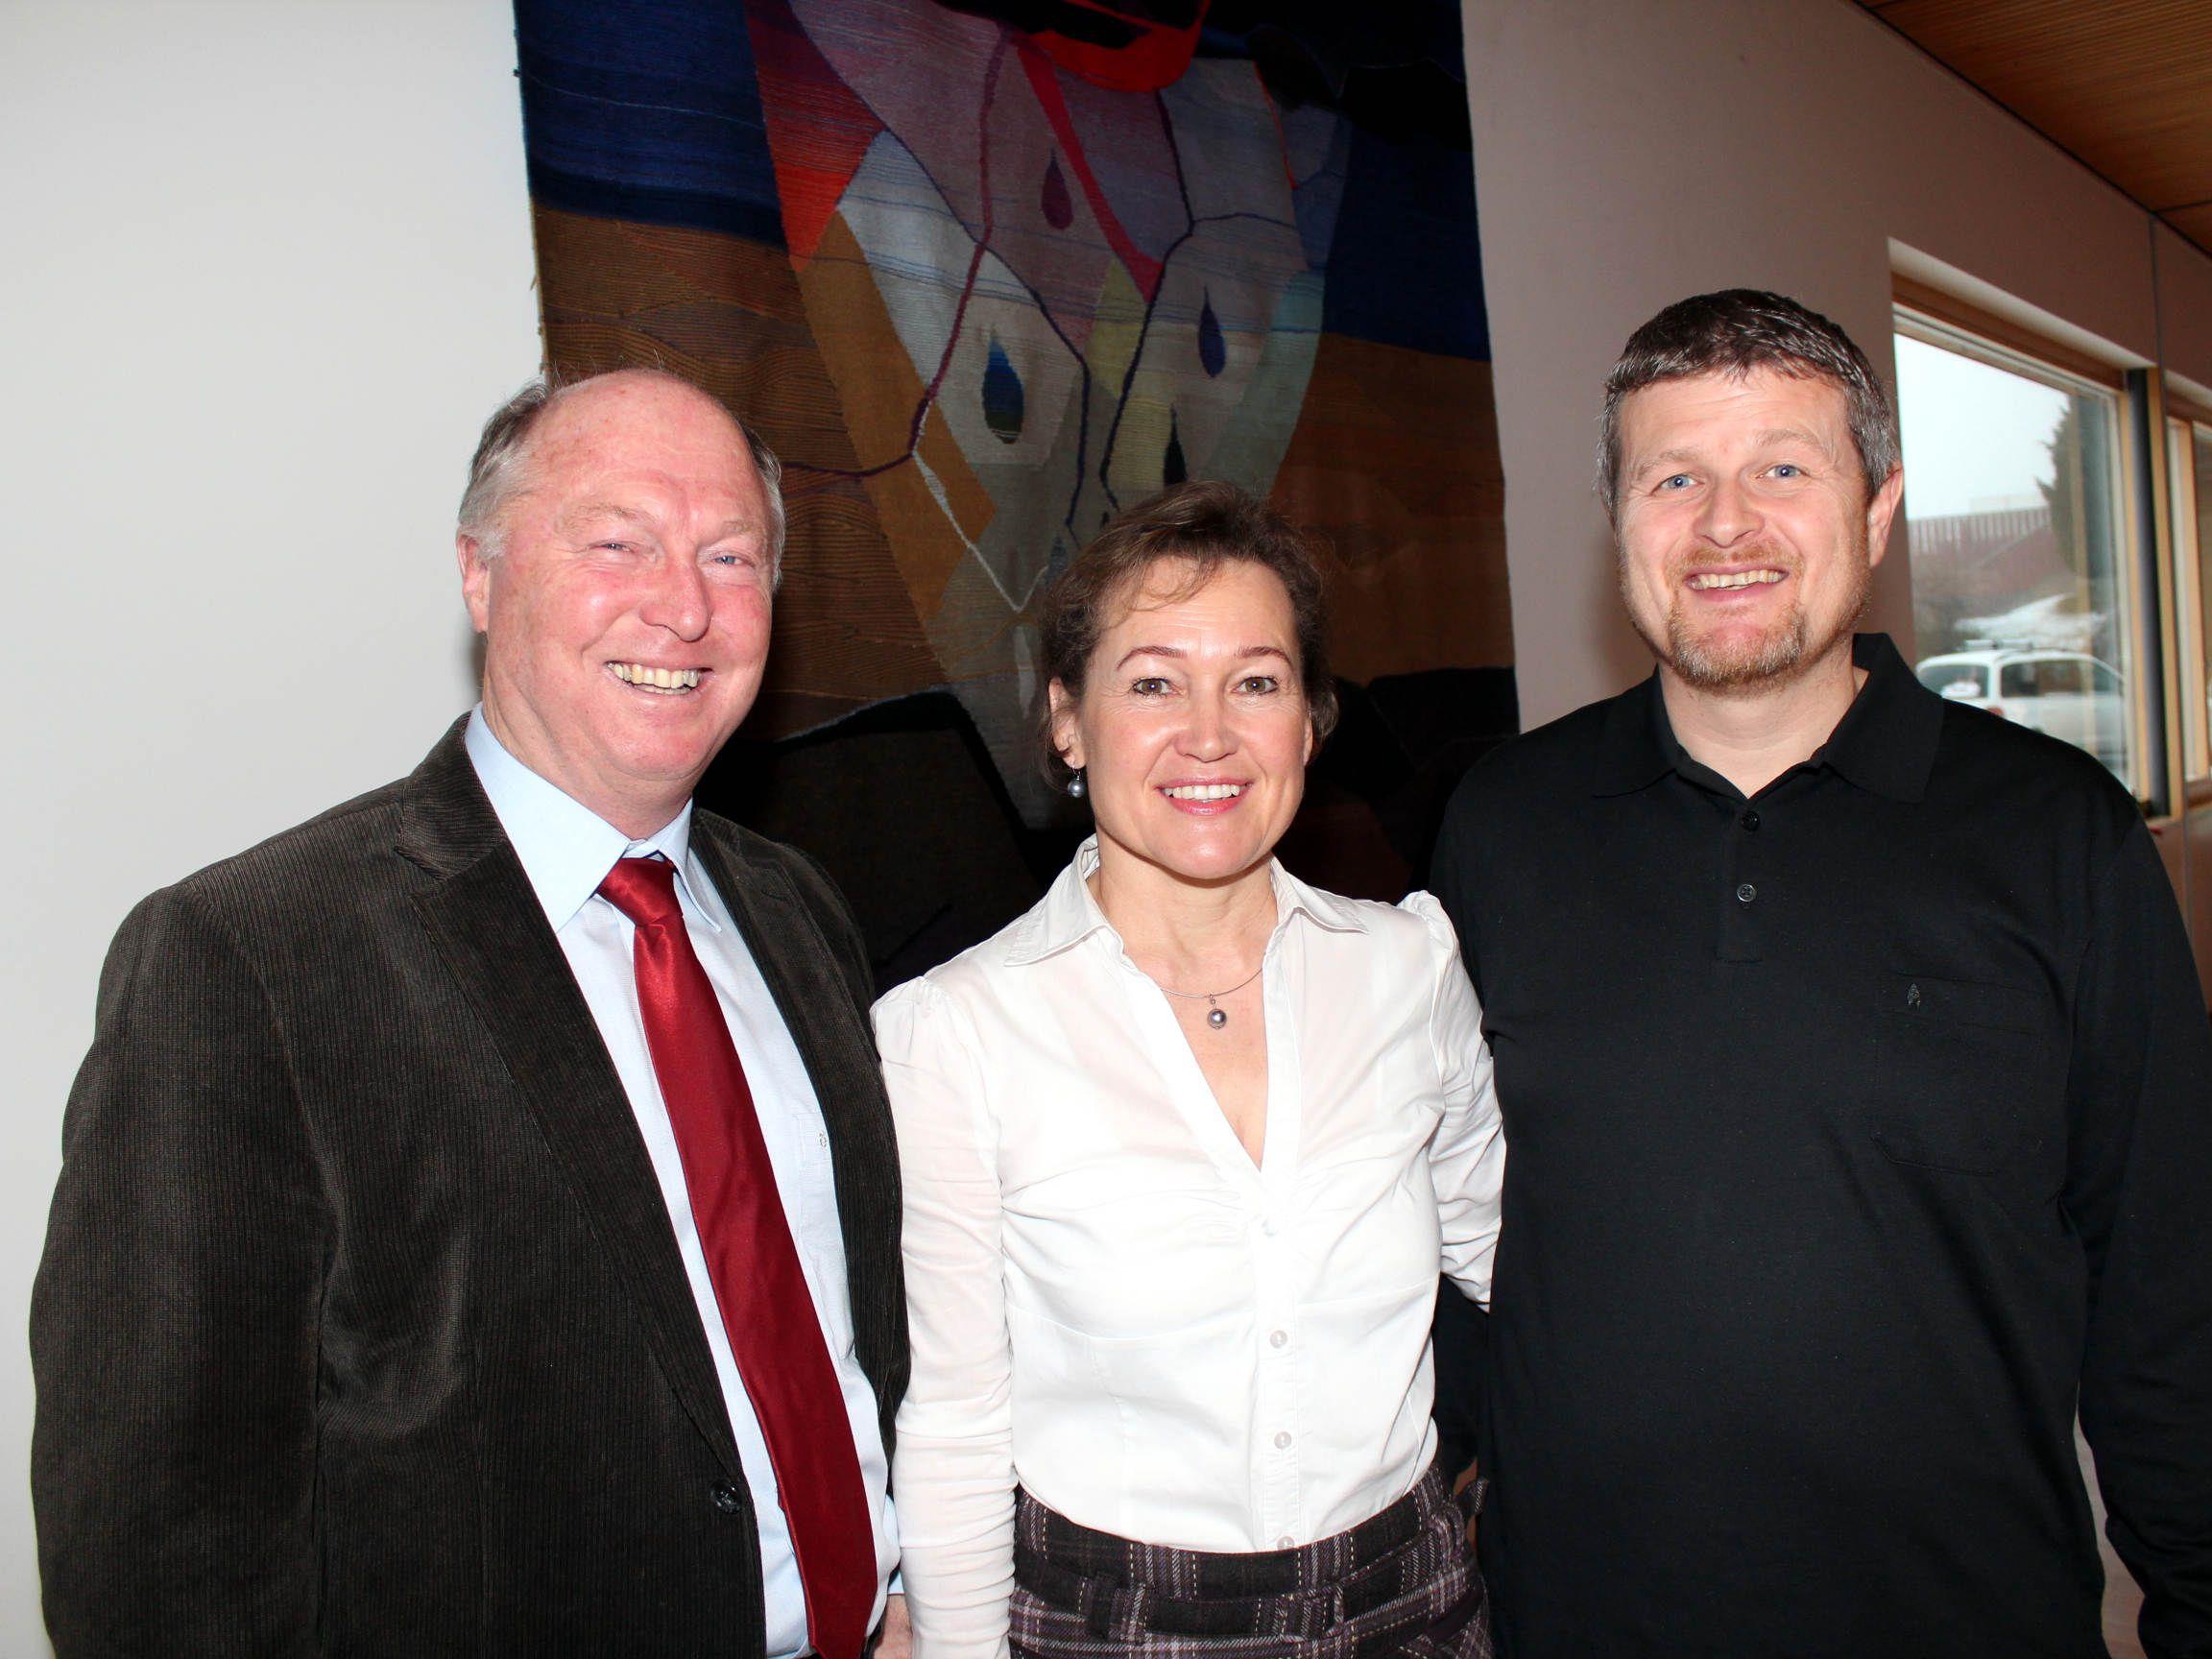 Bgm. Egon Troy, Birgit Giselbrecht-Plankel und Markus Böhler.